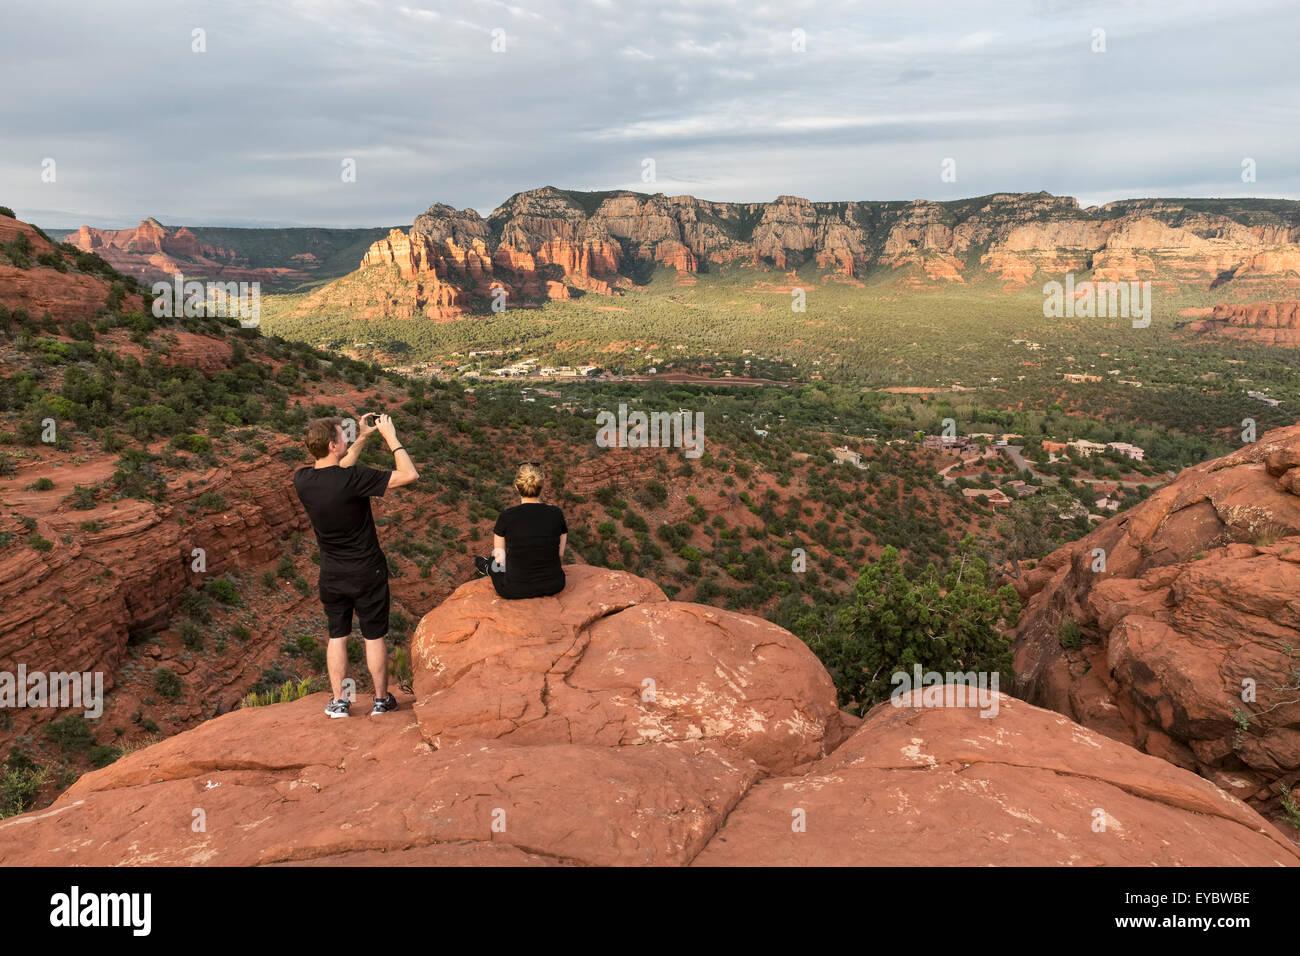 Tourists in Sedona Arizona taking in the view - Stock Image